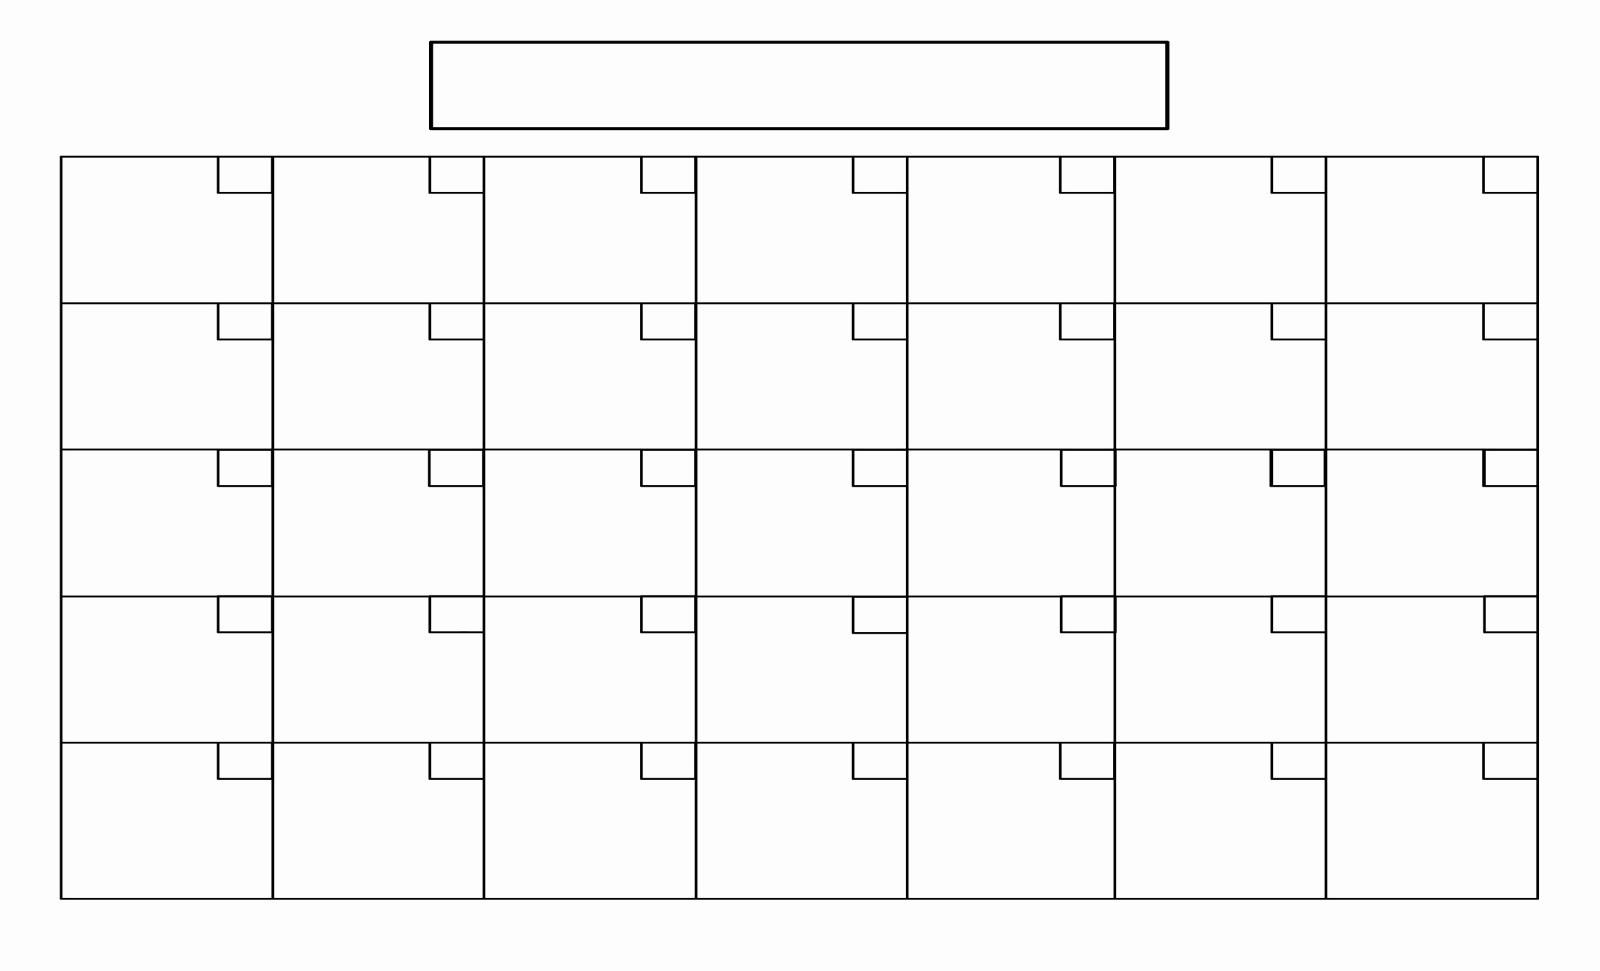 Free Printable Calendar Templates Interesting In Fill In-Fill In Calendar Template